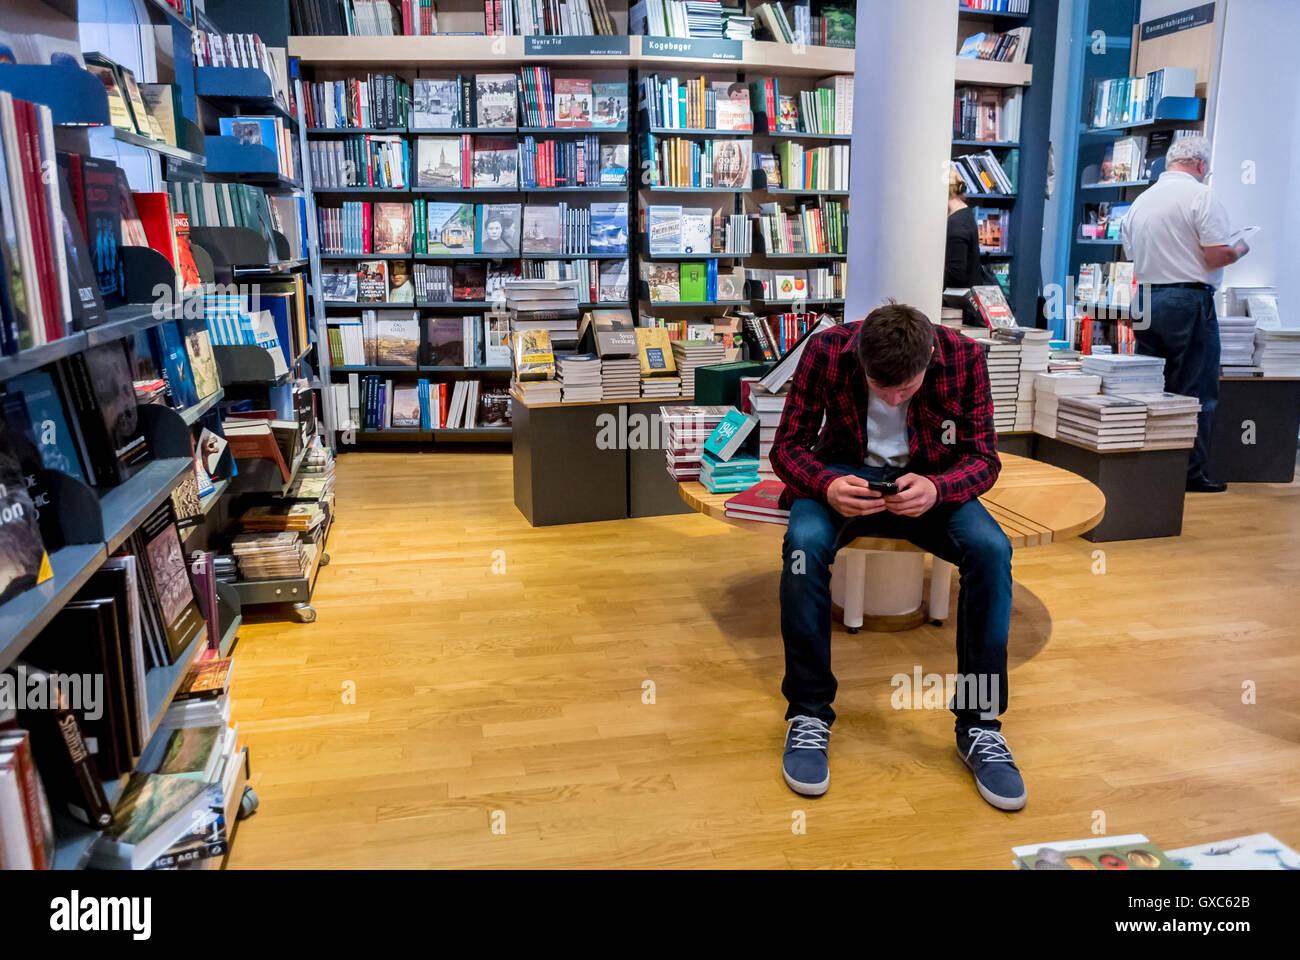 Kopenhagen, Dänemark, innen, das nationale Museum Nationalmuseet, Teen Blick auf Smart Phone in Buchhandlung Stockfoto